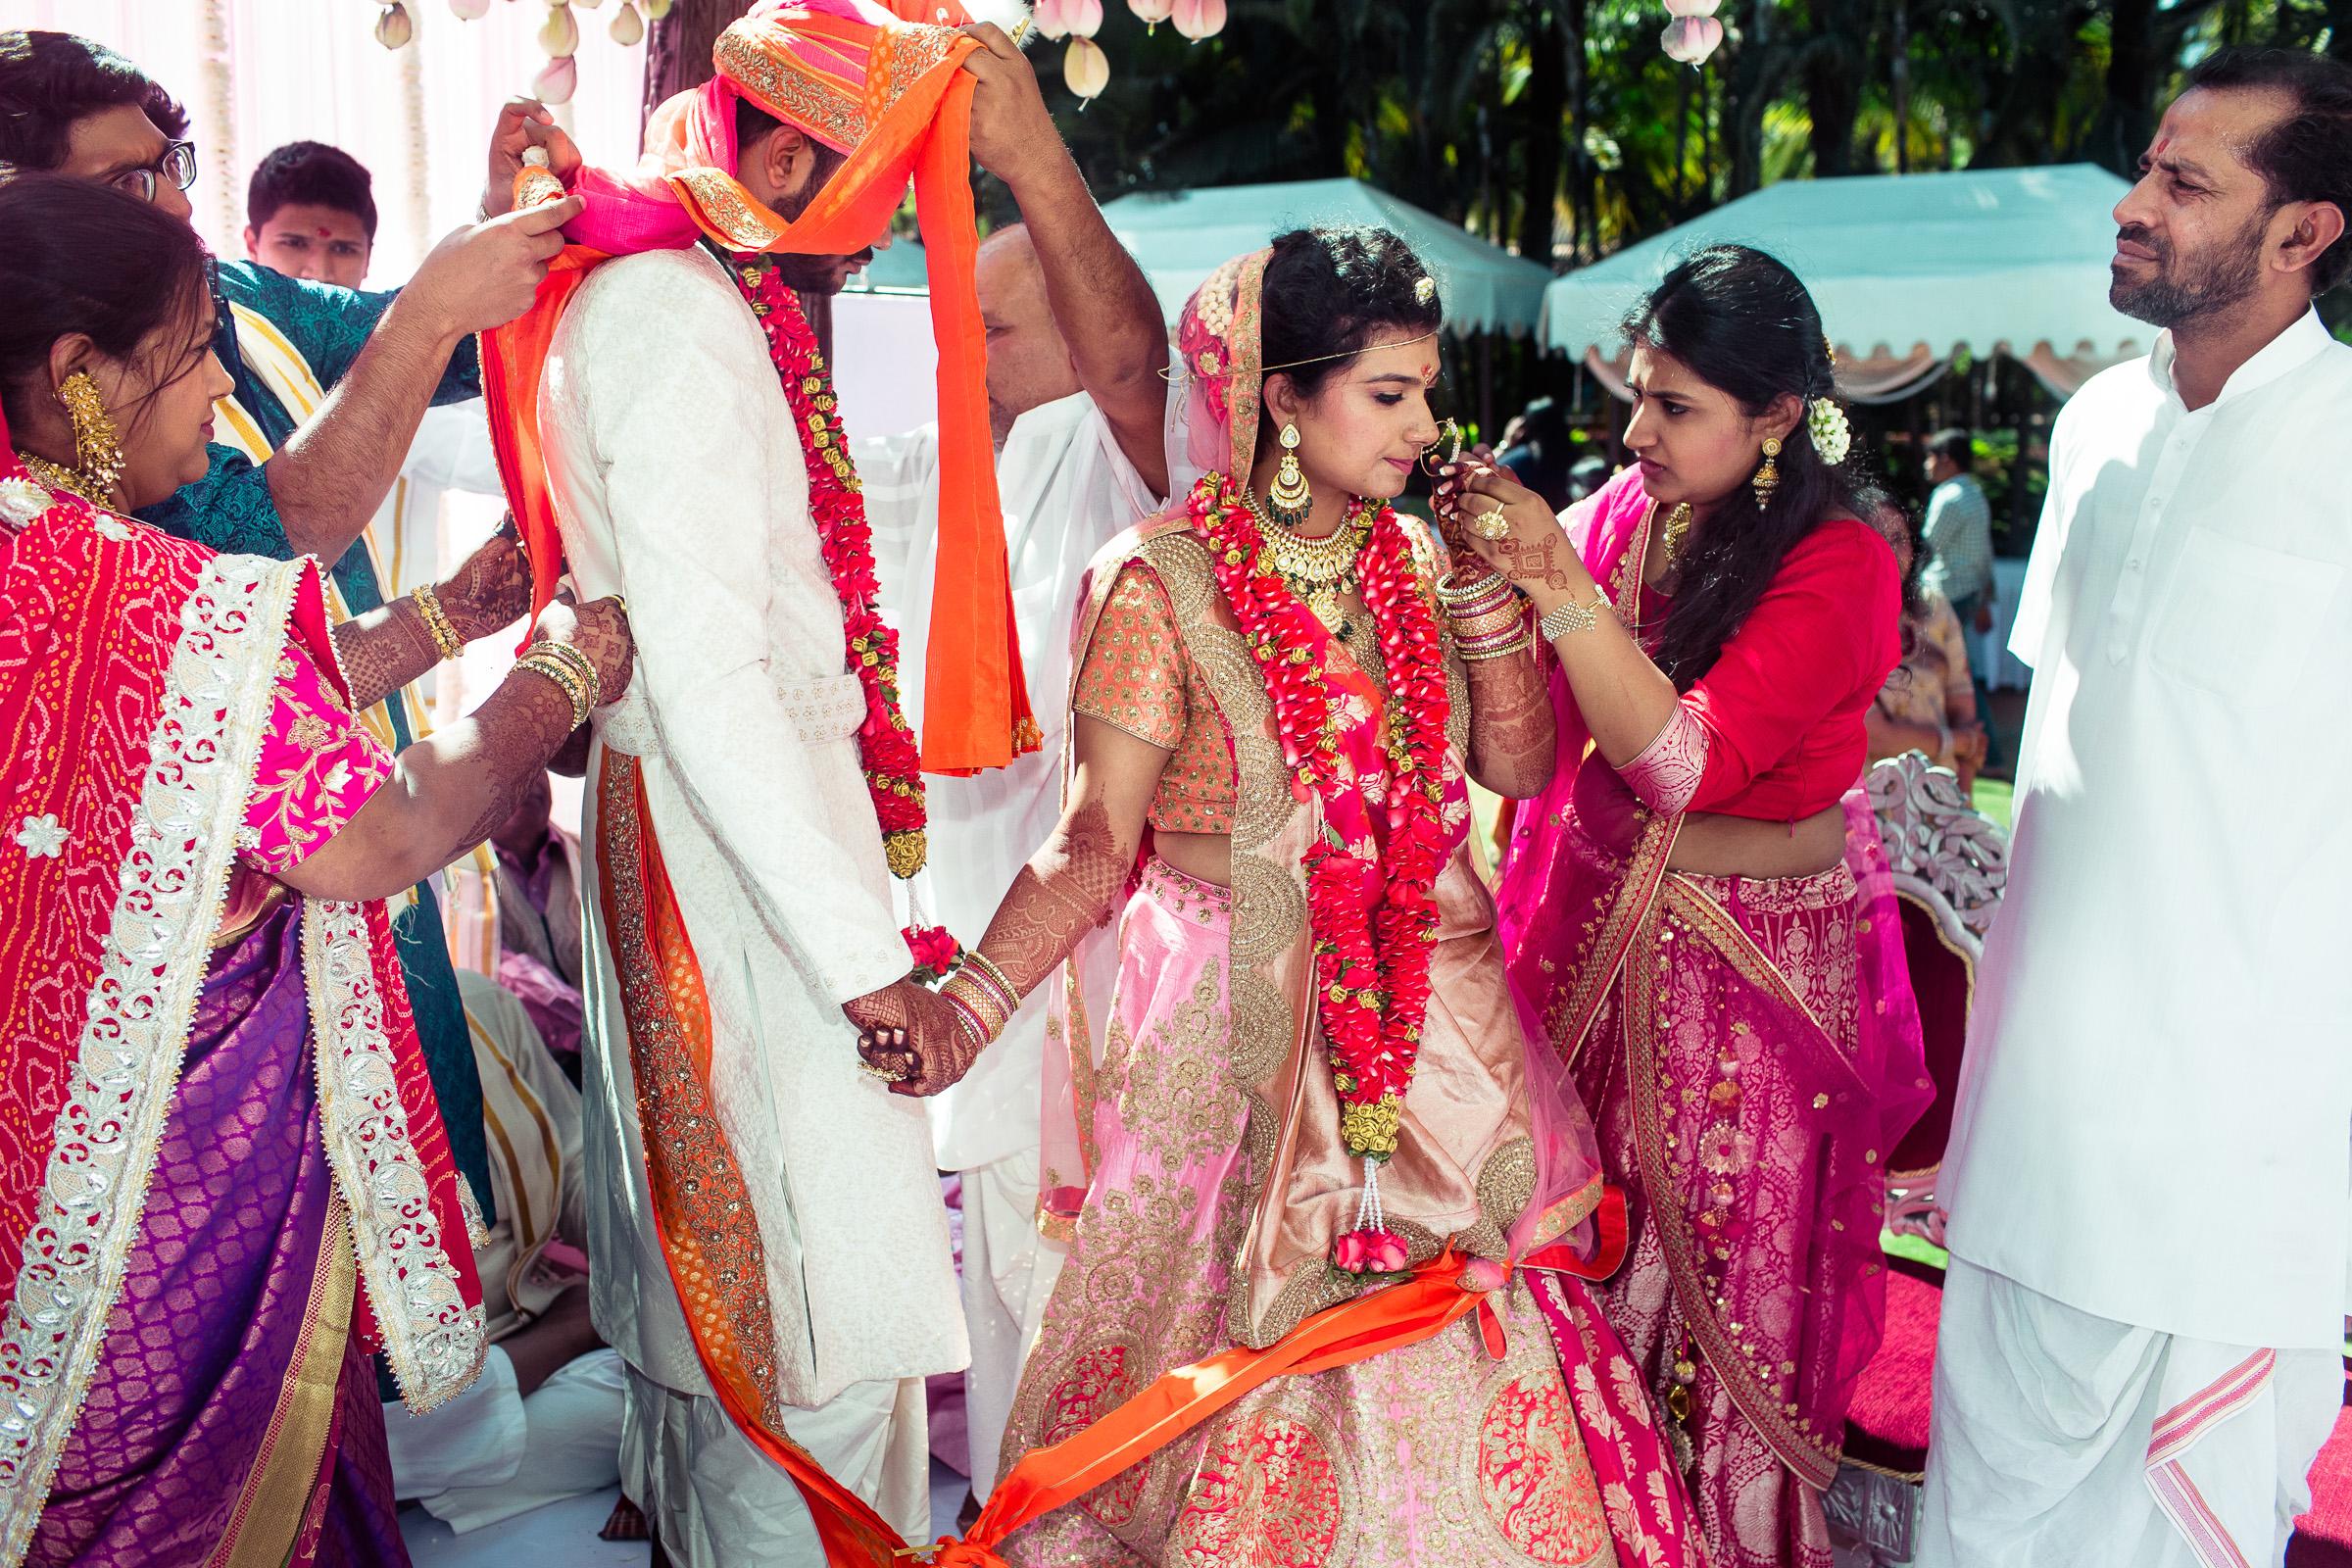 marwari-candid-wedding-photographers-bangalore-0037.jpg